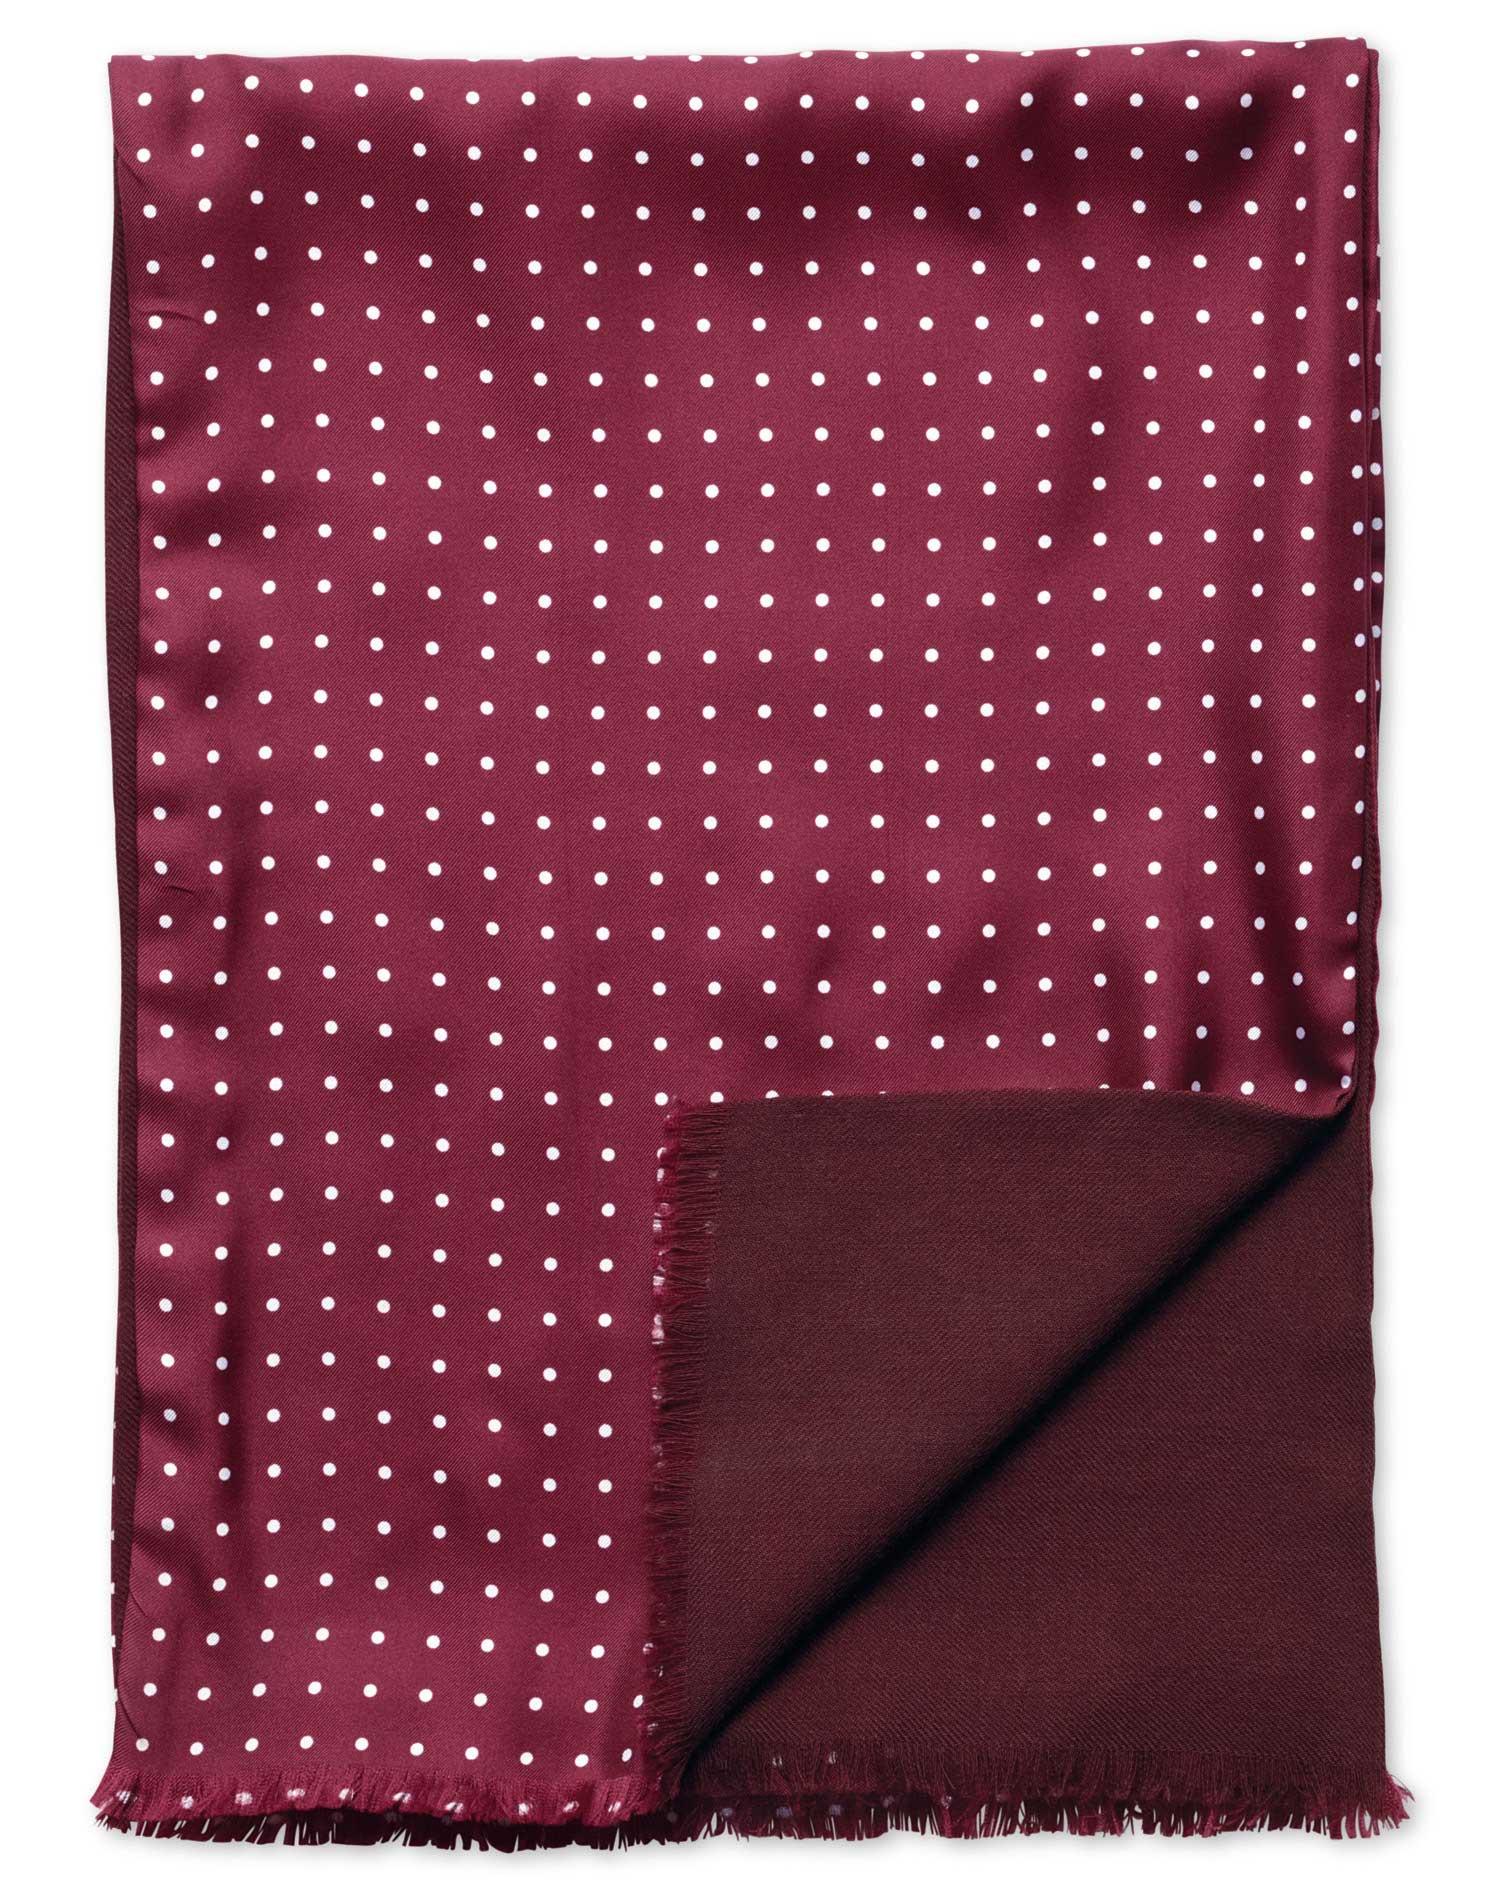 Burgundy Spot Printed Silk Scarf Size OSFA by Charles Tyrwhitt